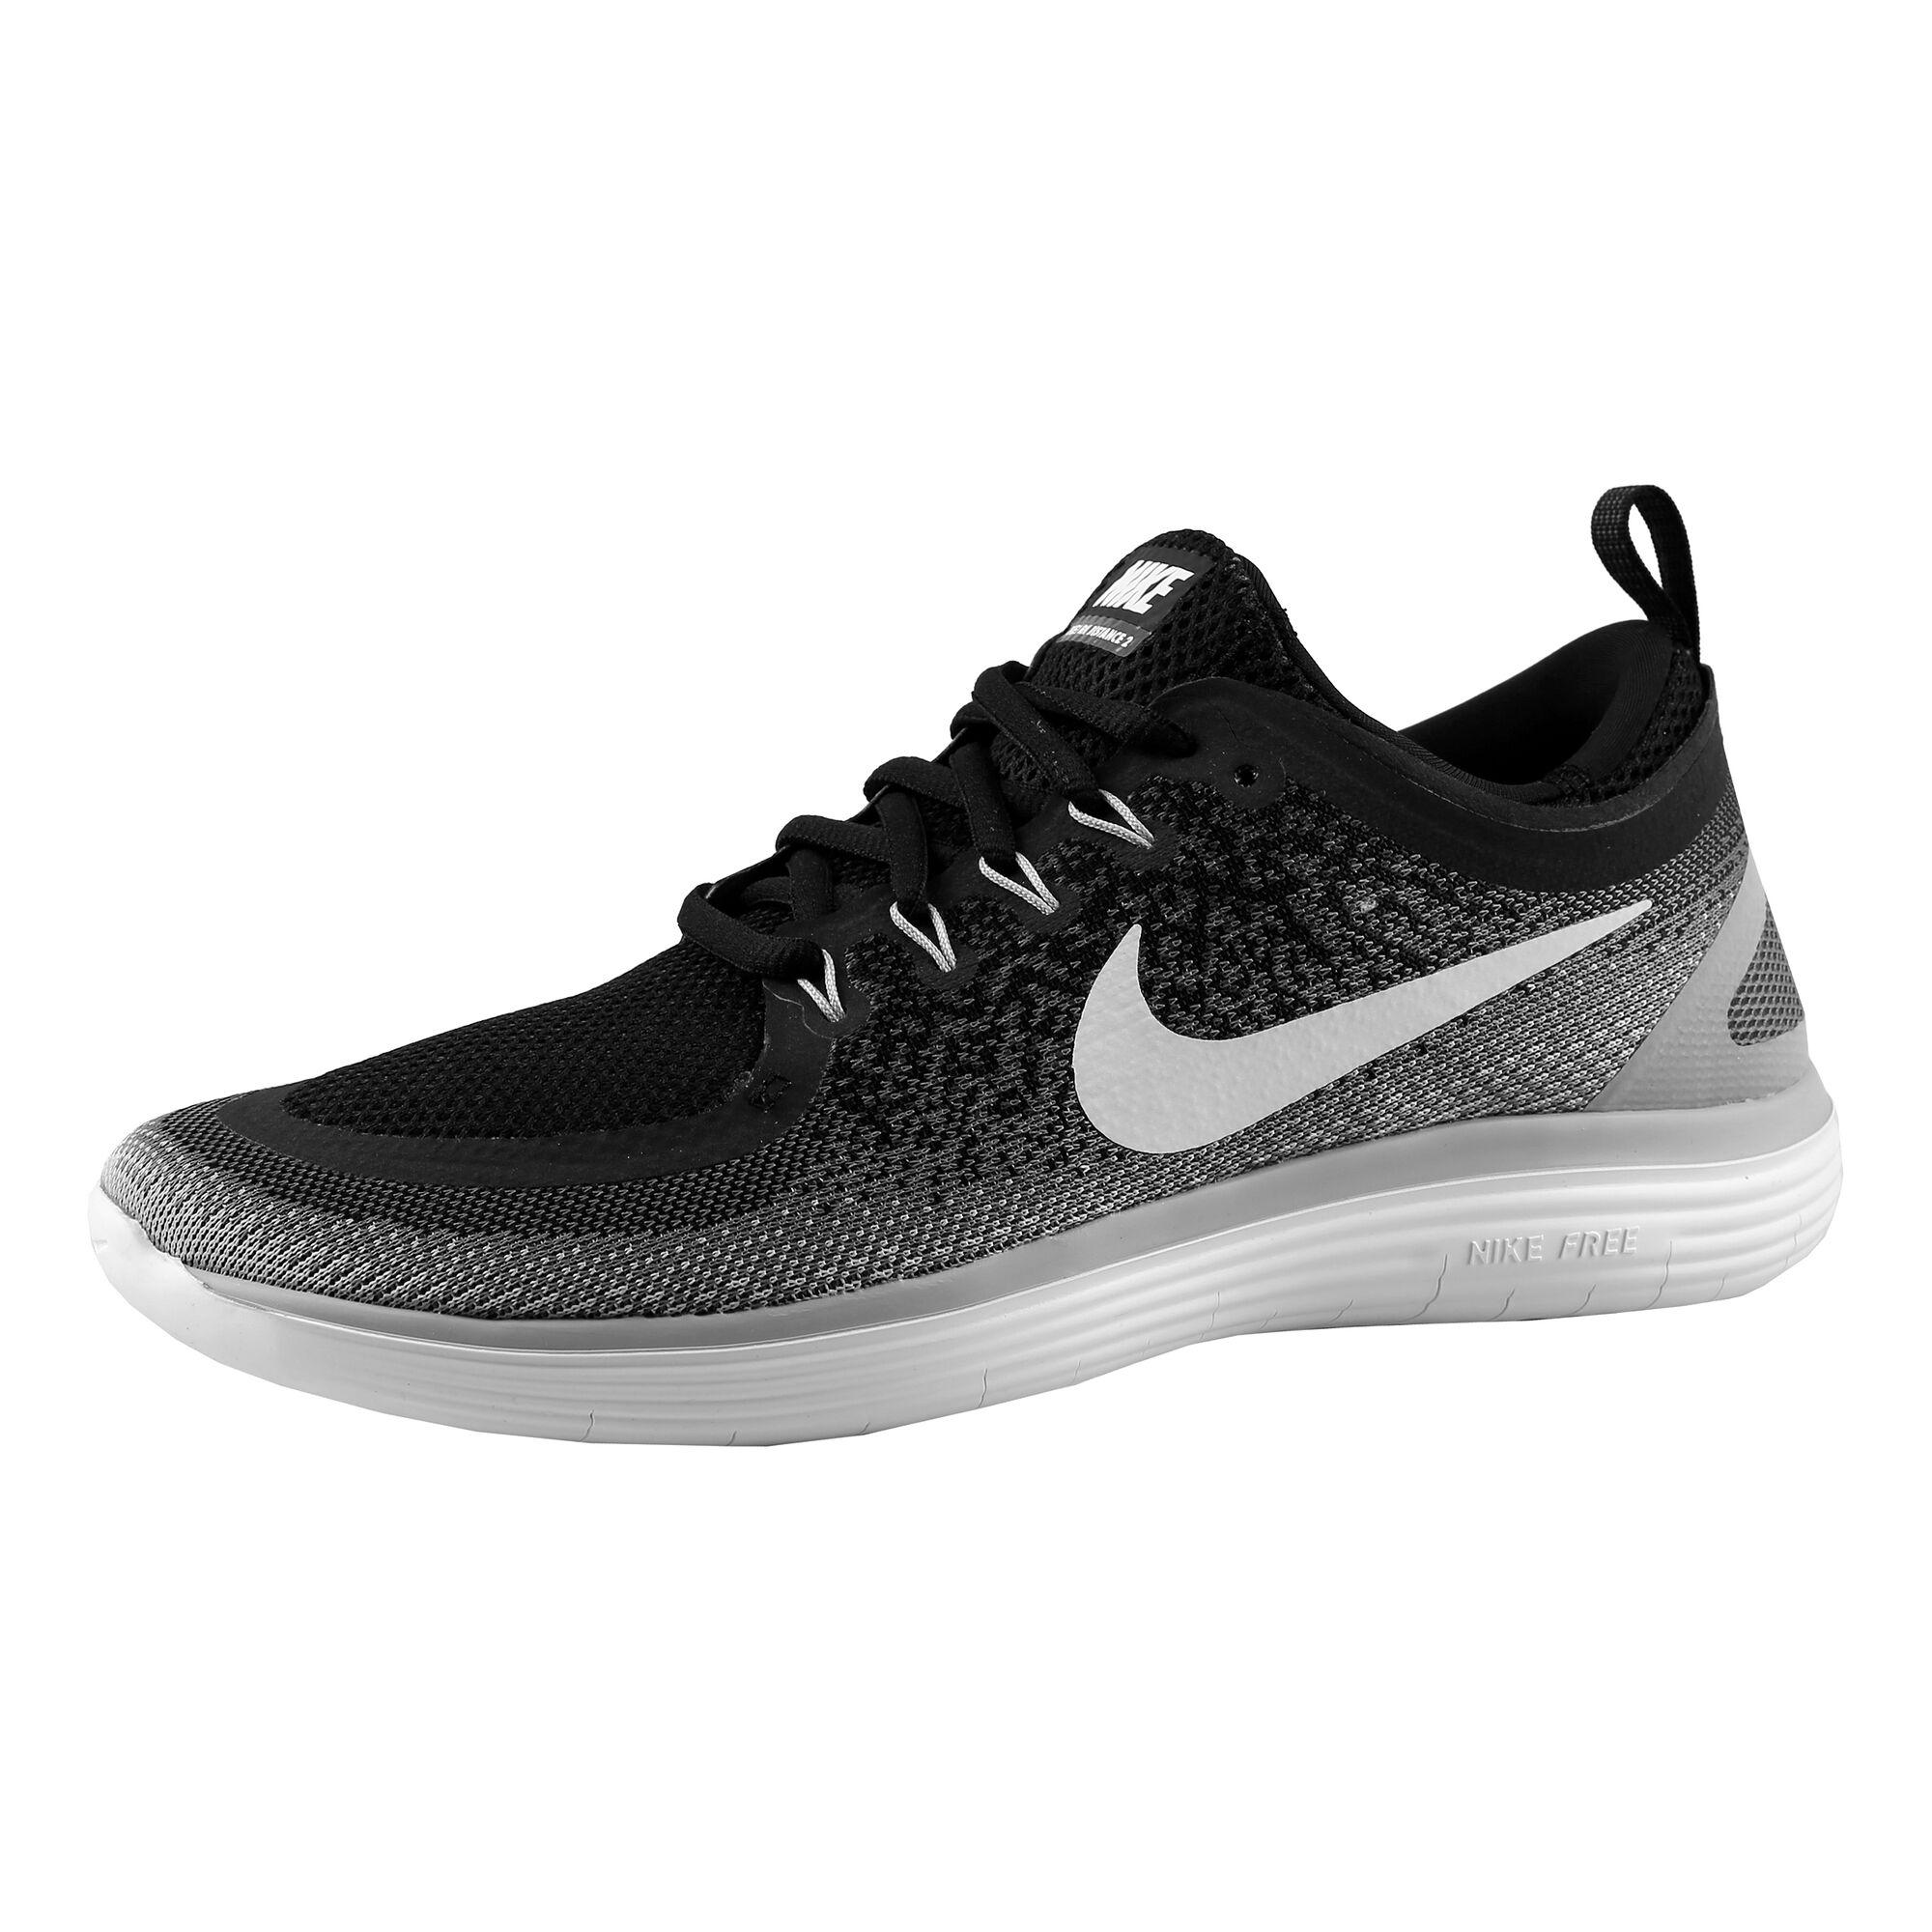 reputable site dde74 82df2 Nike Free Run Distance 2 Natural-Running Schuh Damen - Schwa